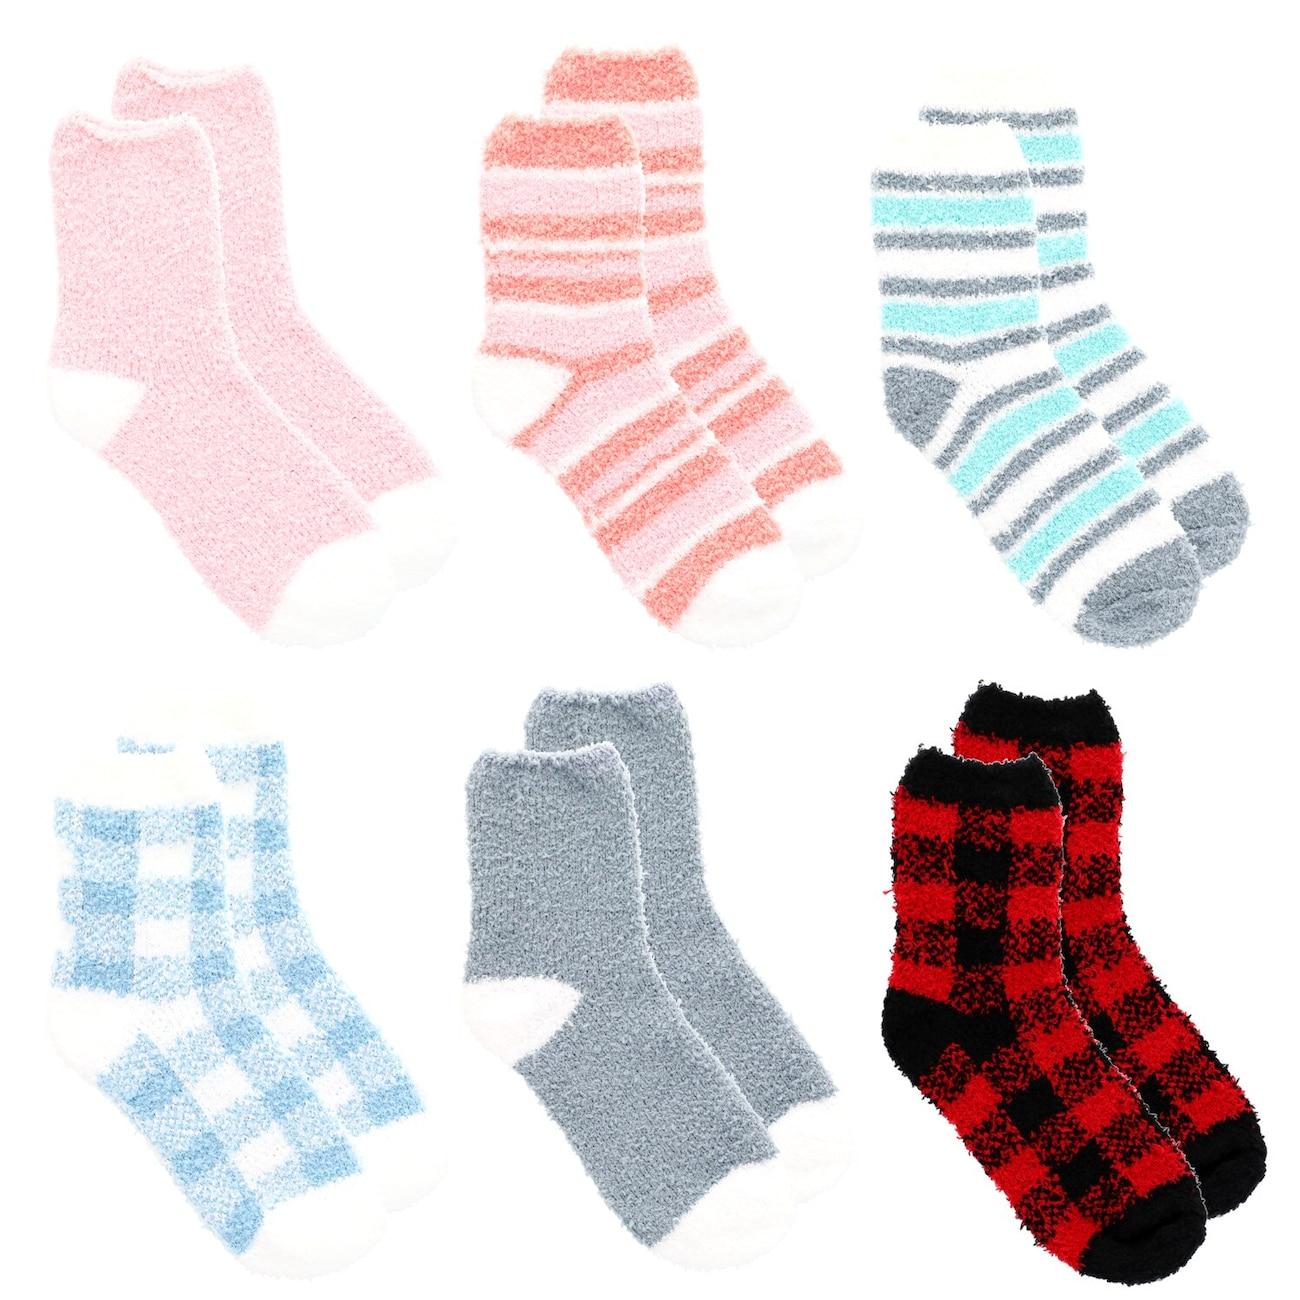 7e33abf0529c2 Ladies' Snugadoo Too Super-Soft Socks